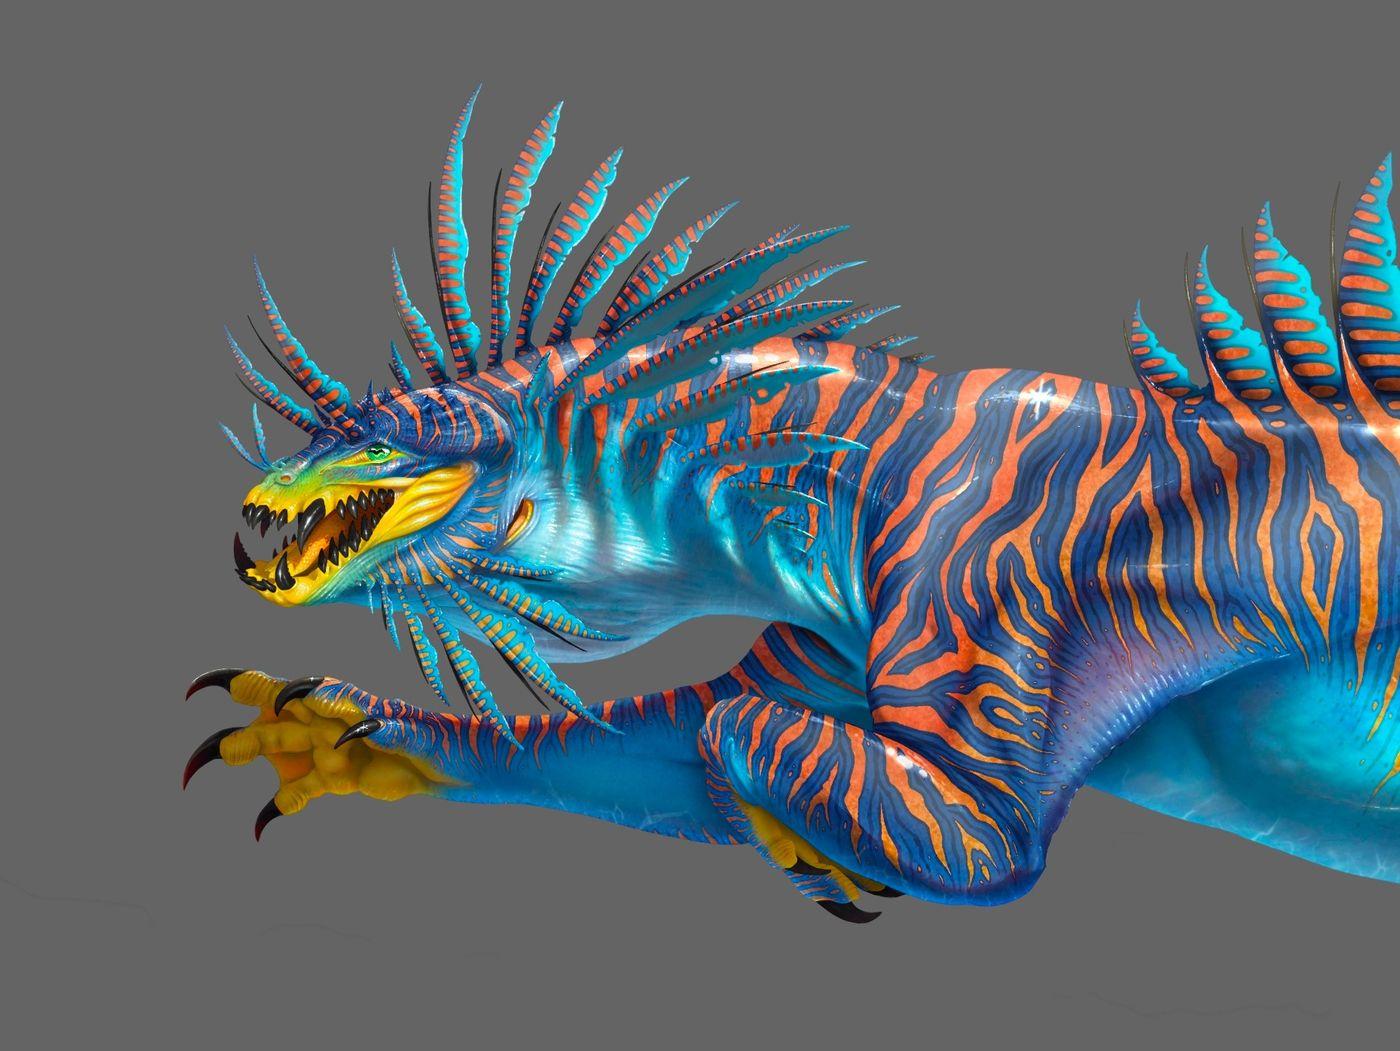 Sabreosk: A Creature Concept